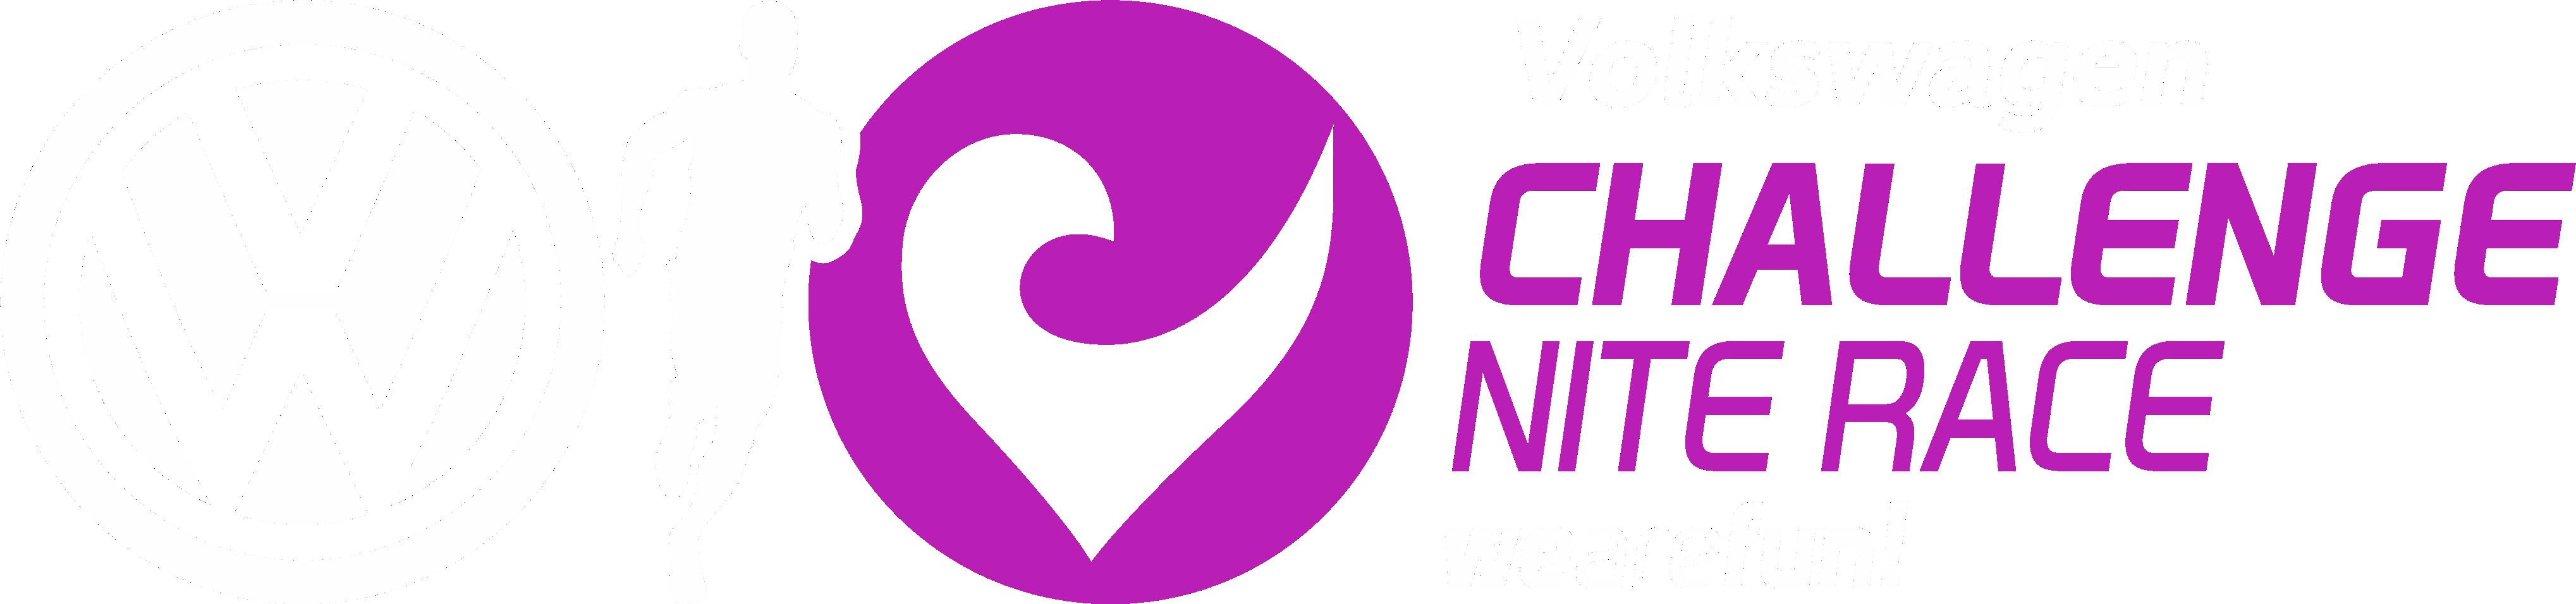 Logo-VW-Challenge-Nite-Race-7